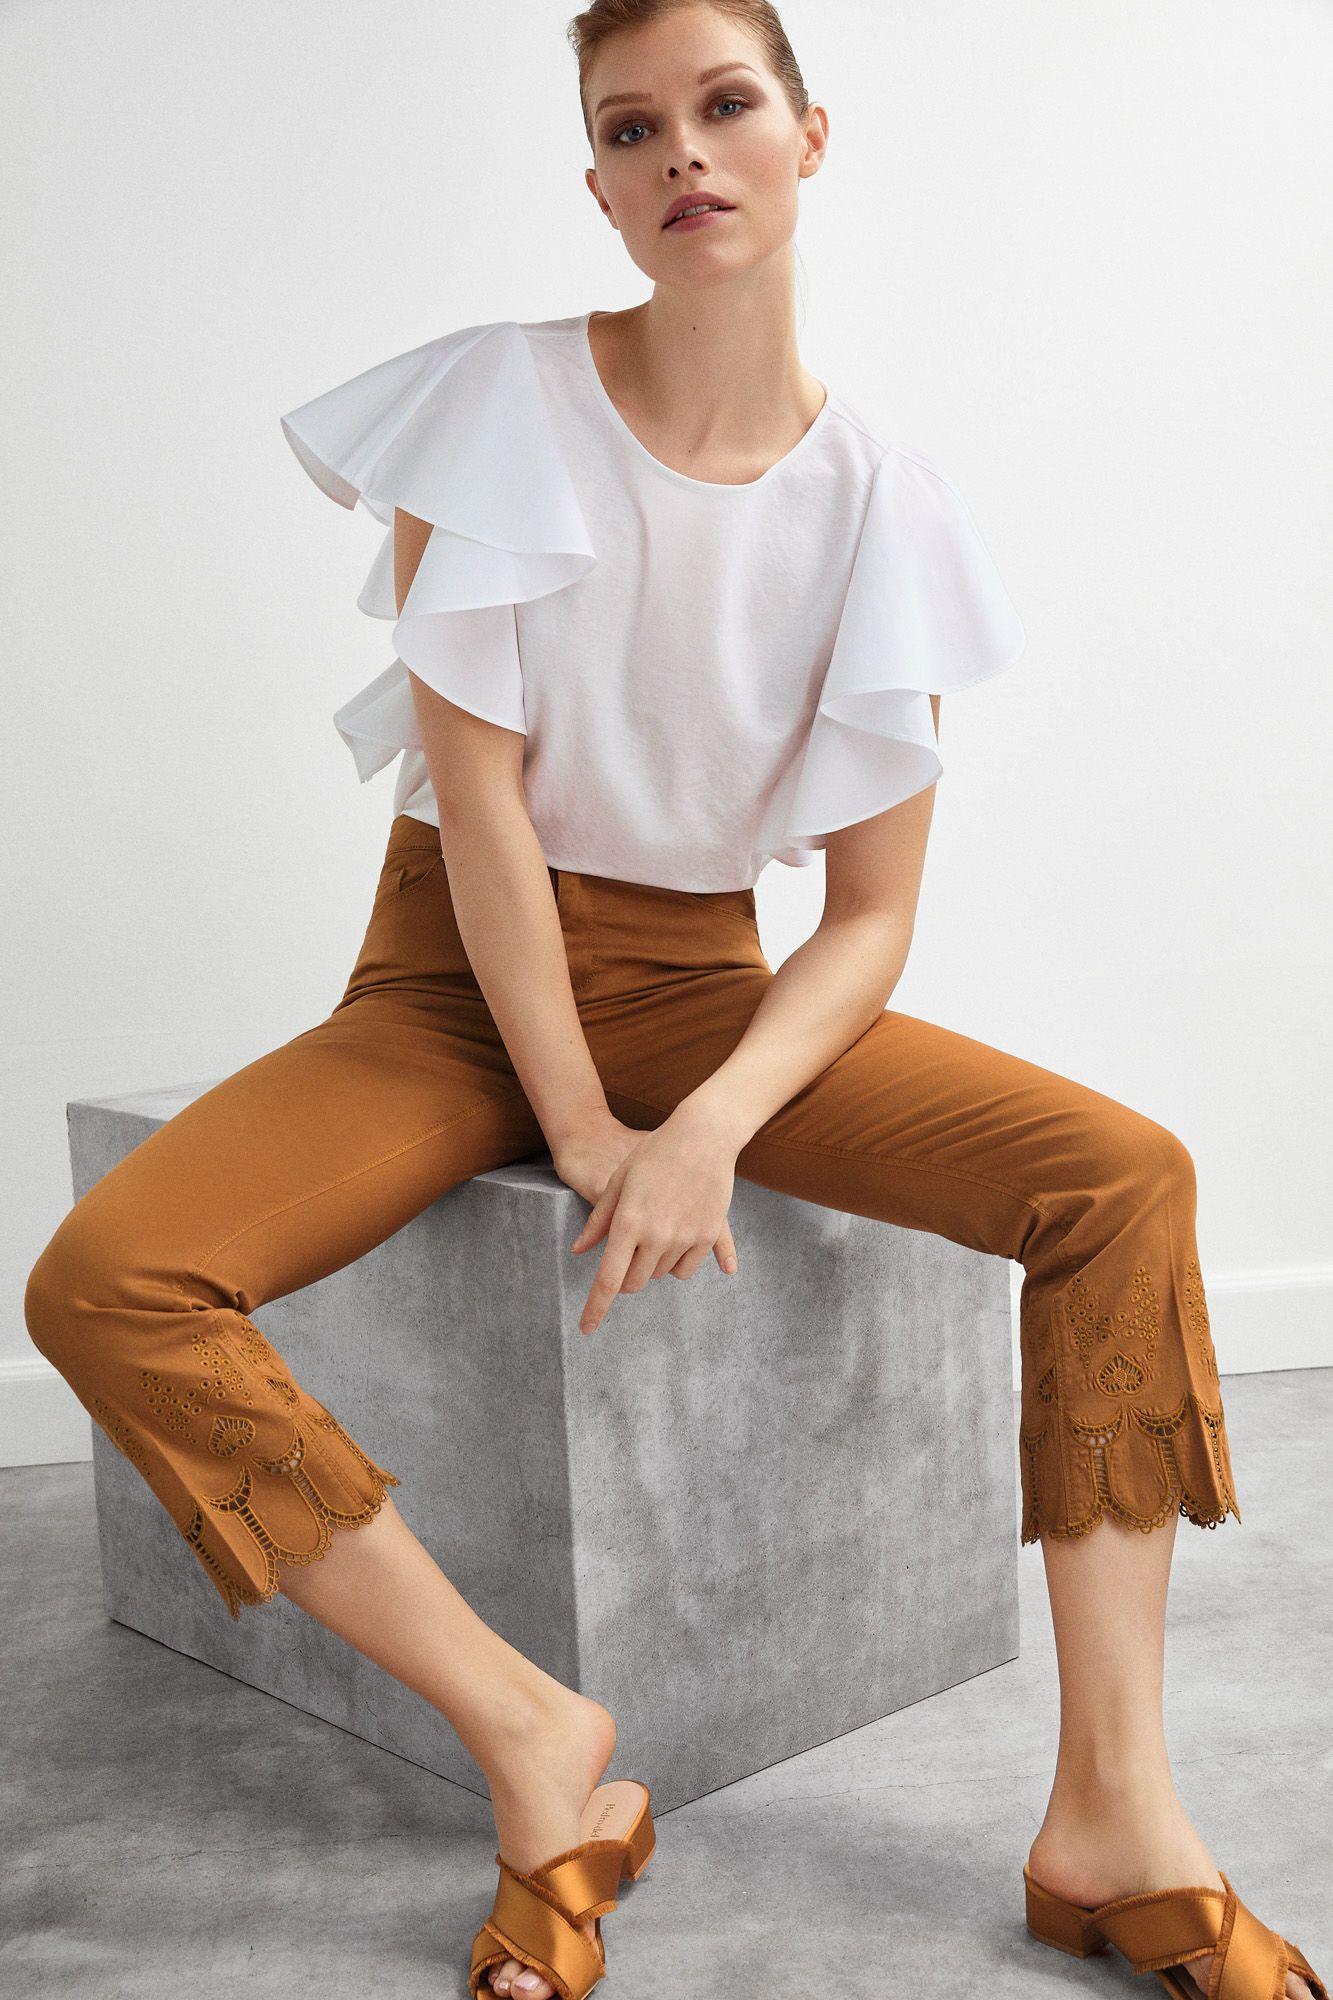 Catálogo Pedro Del Hierro Primavera Verano 2020 Moda En Pasarela Pantalones De Moda Mujer Moda Moda Verano